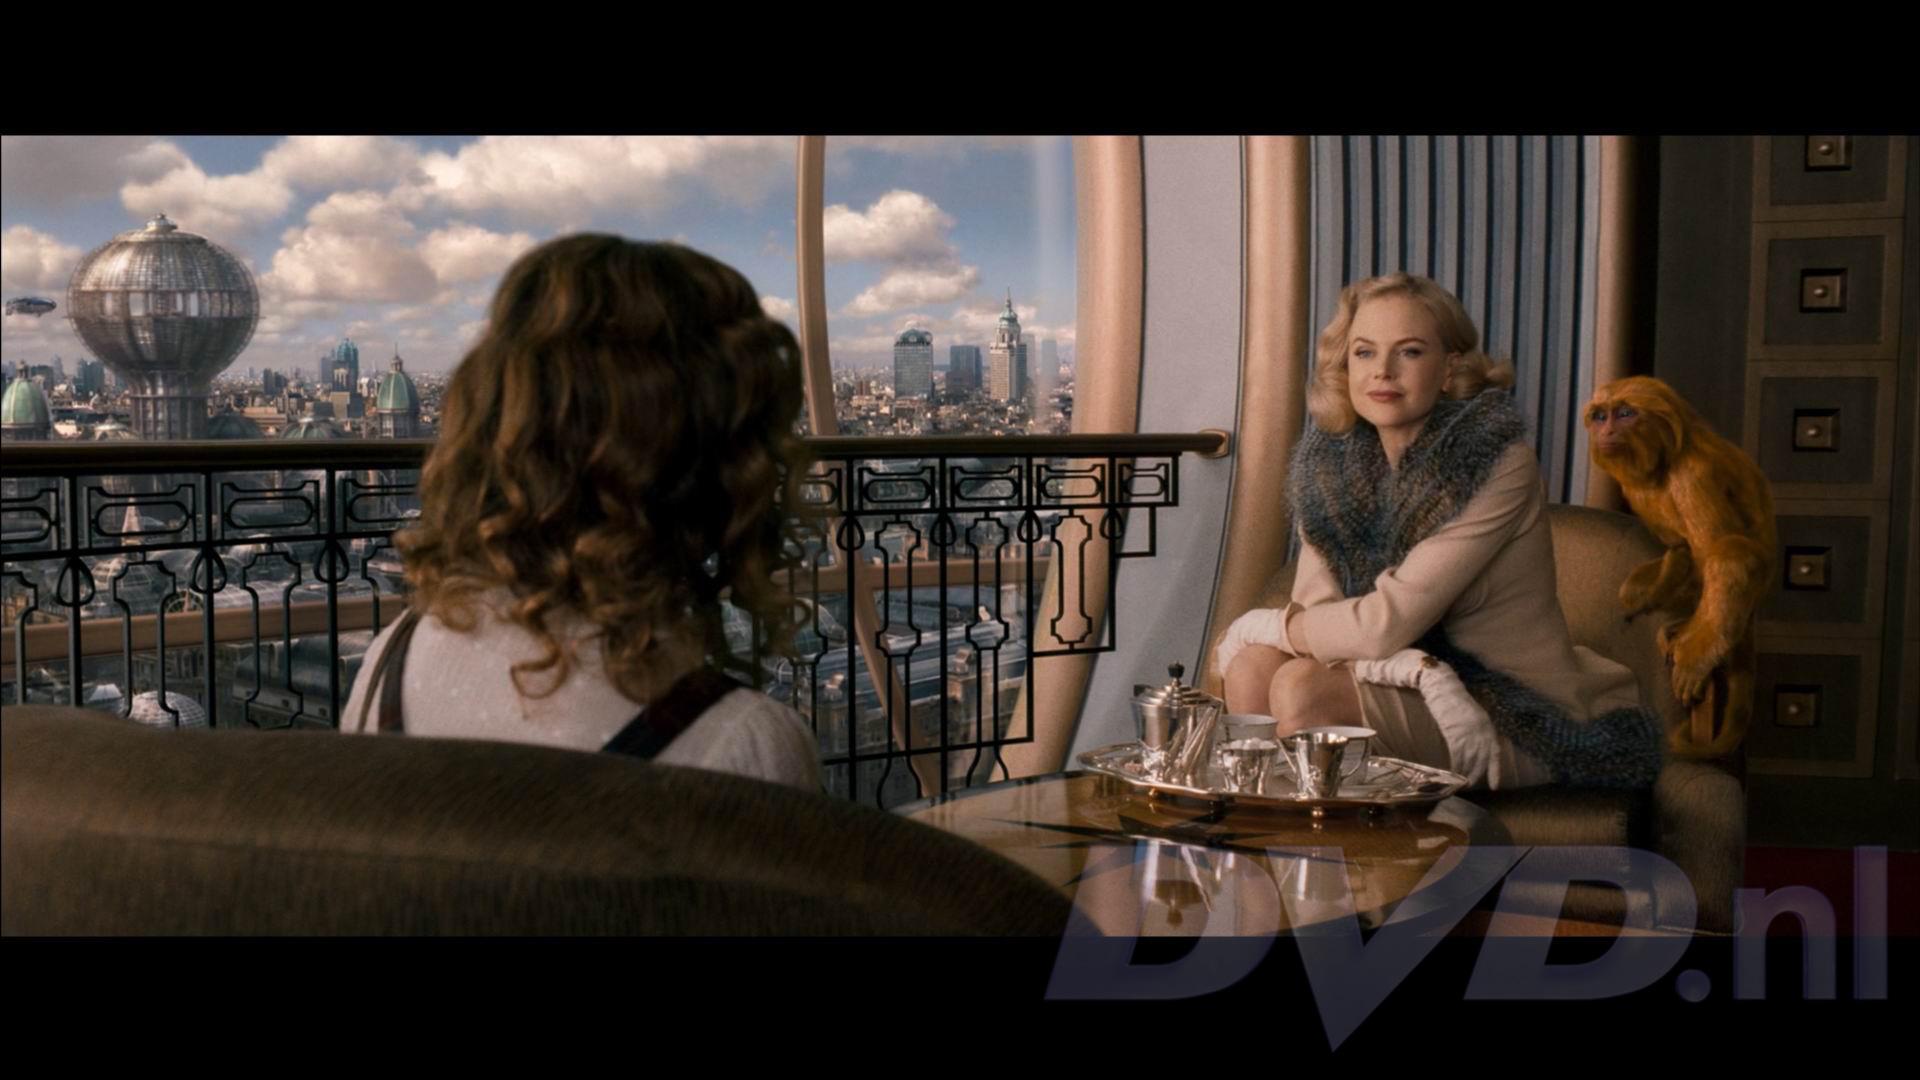 https://allesoverfilm.nl/media/uploads/uploads_old_site/reviews/3989/shot2_large_hd.jpg